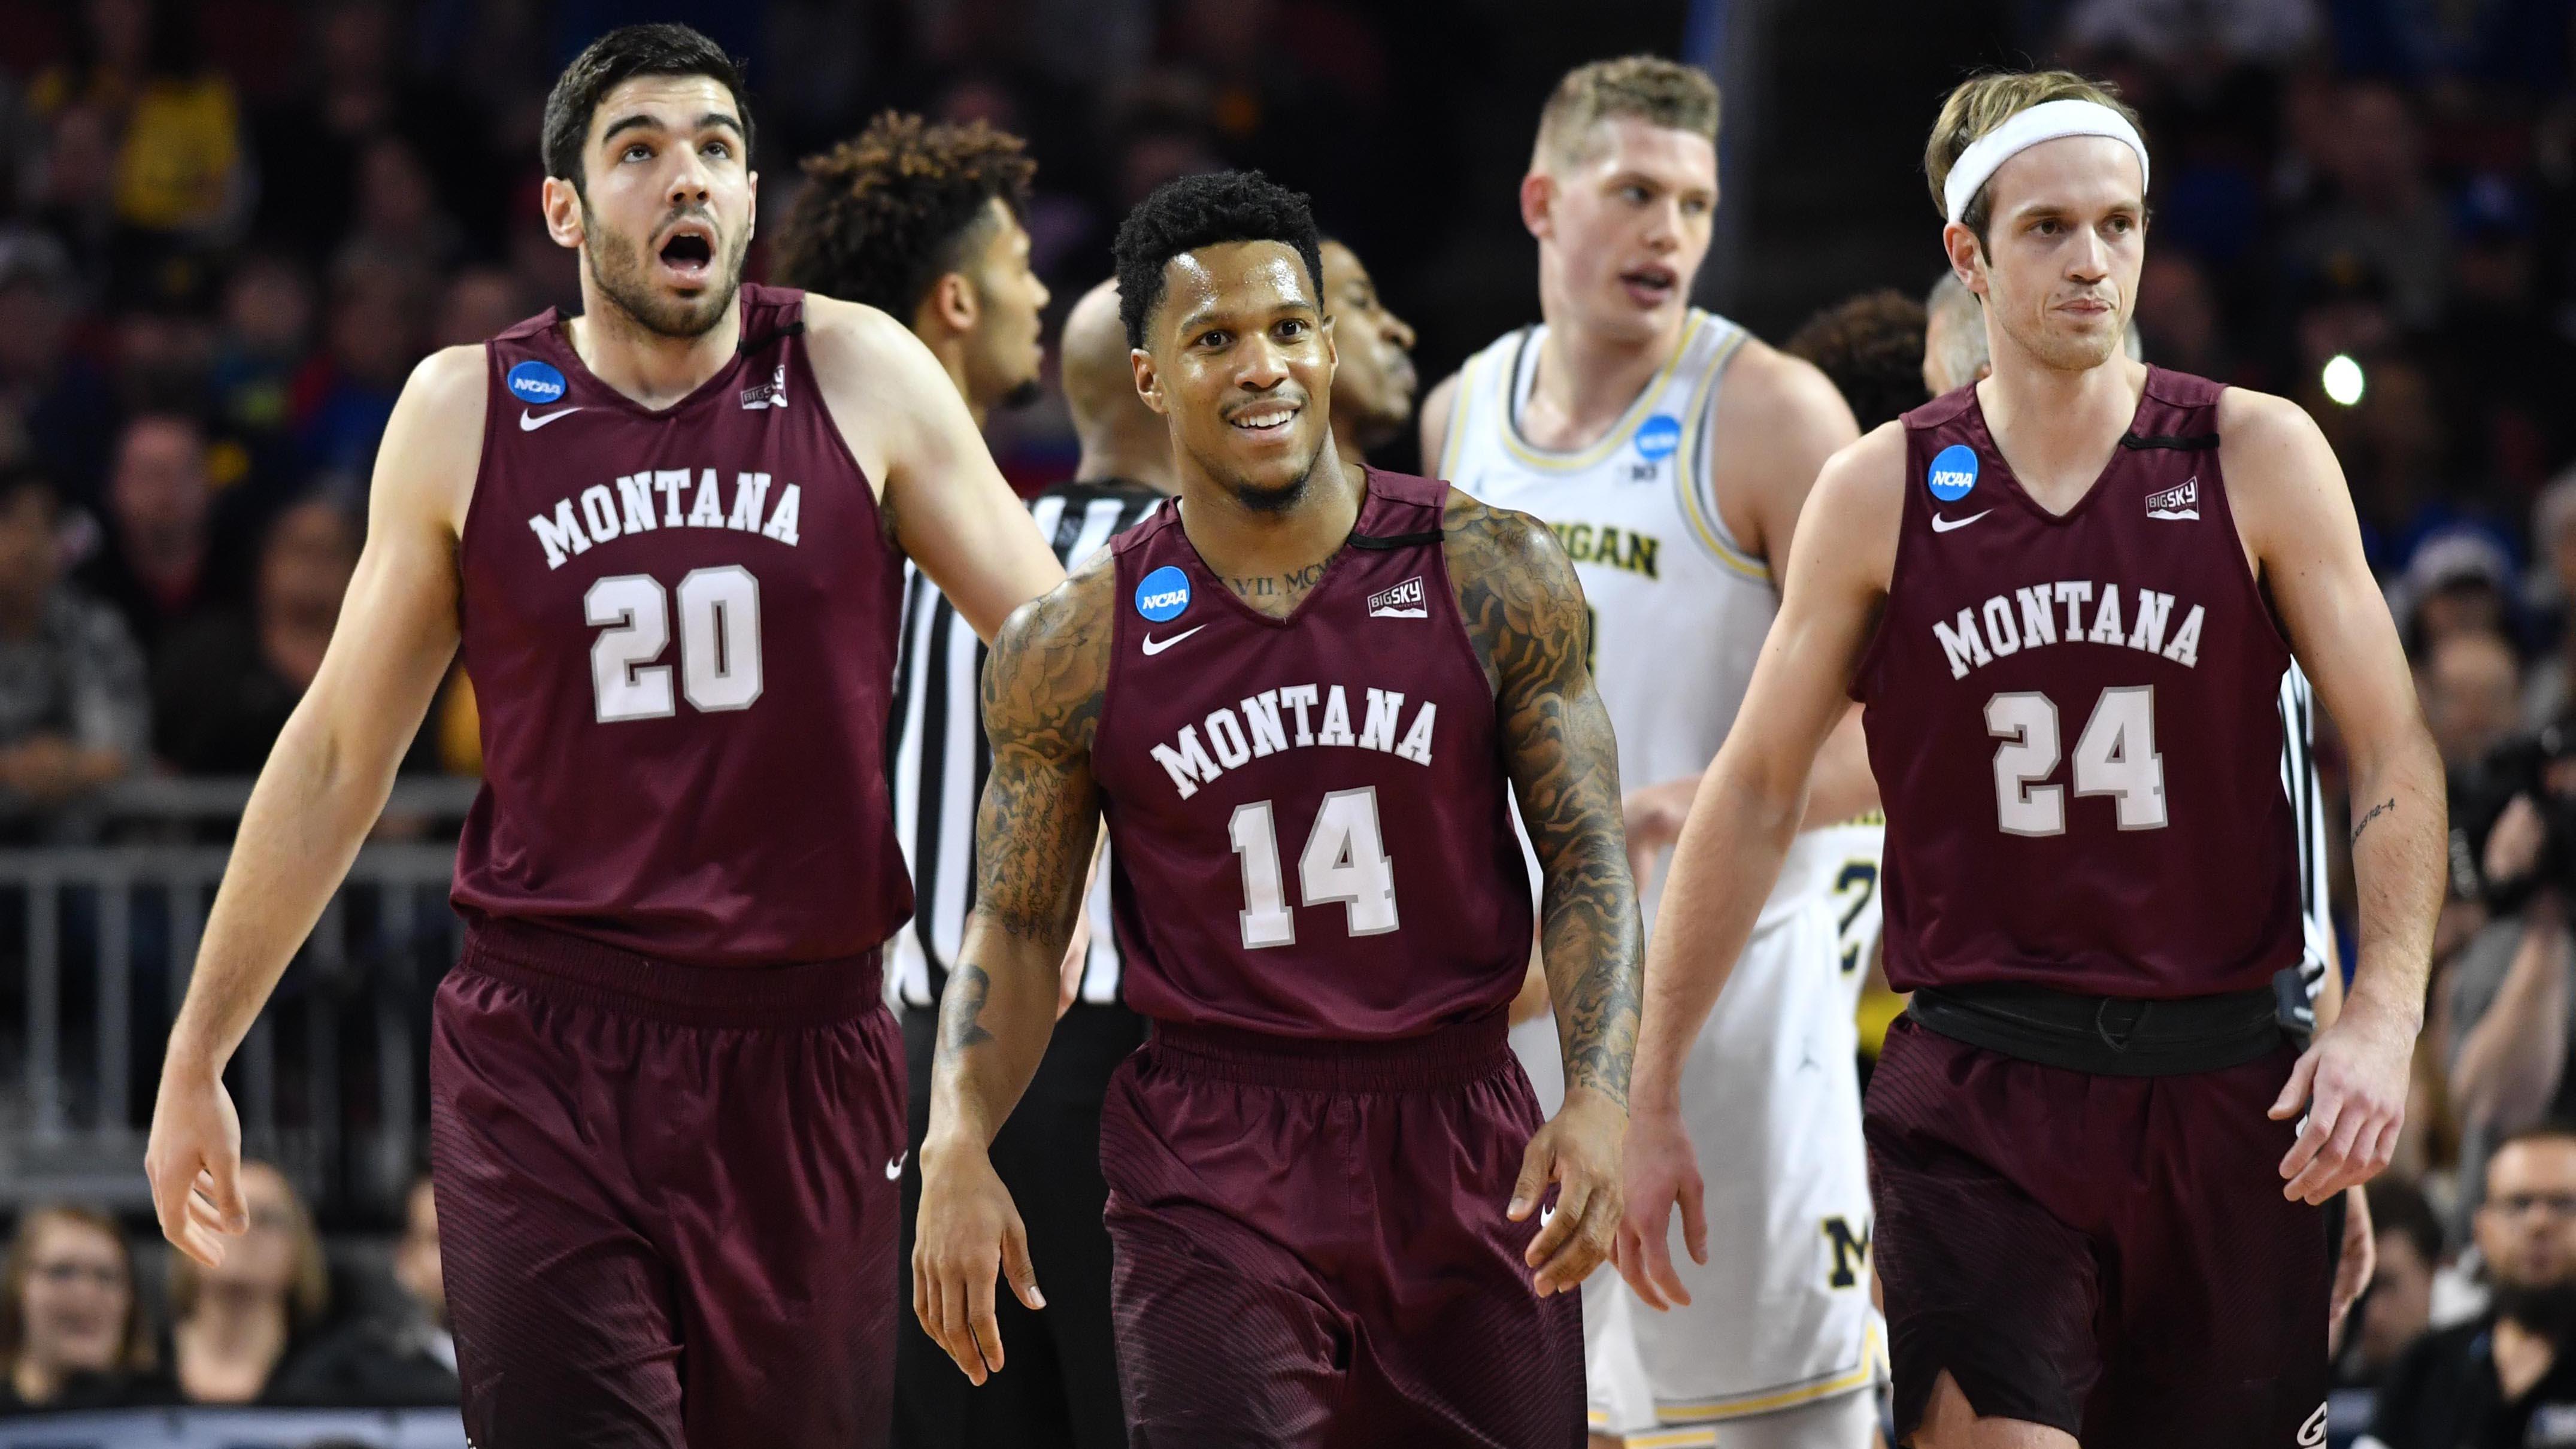 Montana basketball plays Michigan